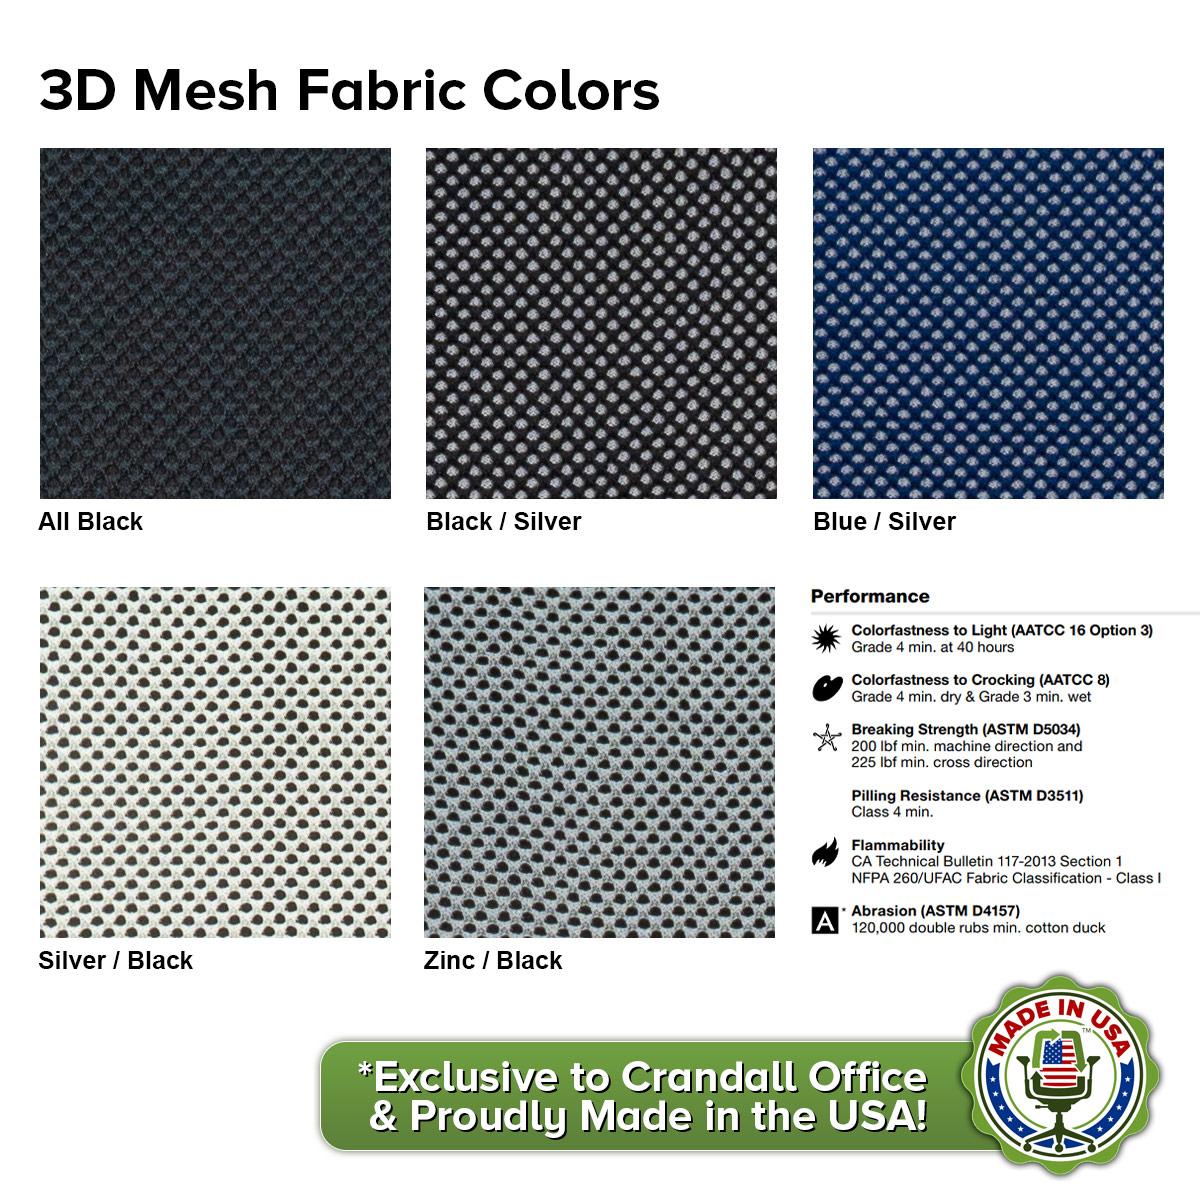 Crandall Office 3D Mesh Fabric Colors